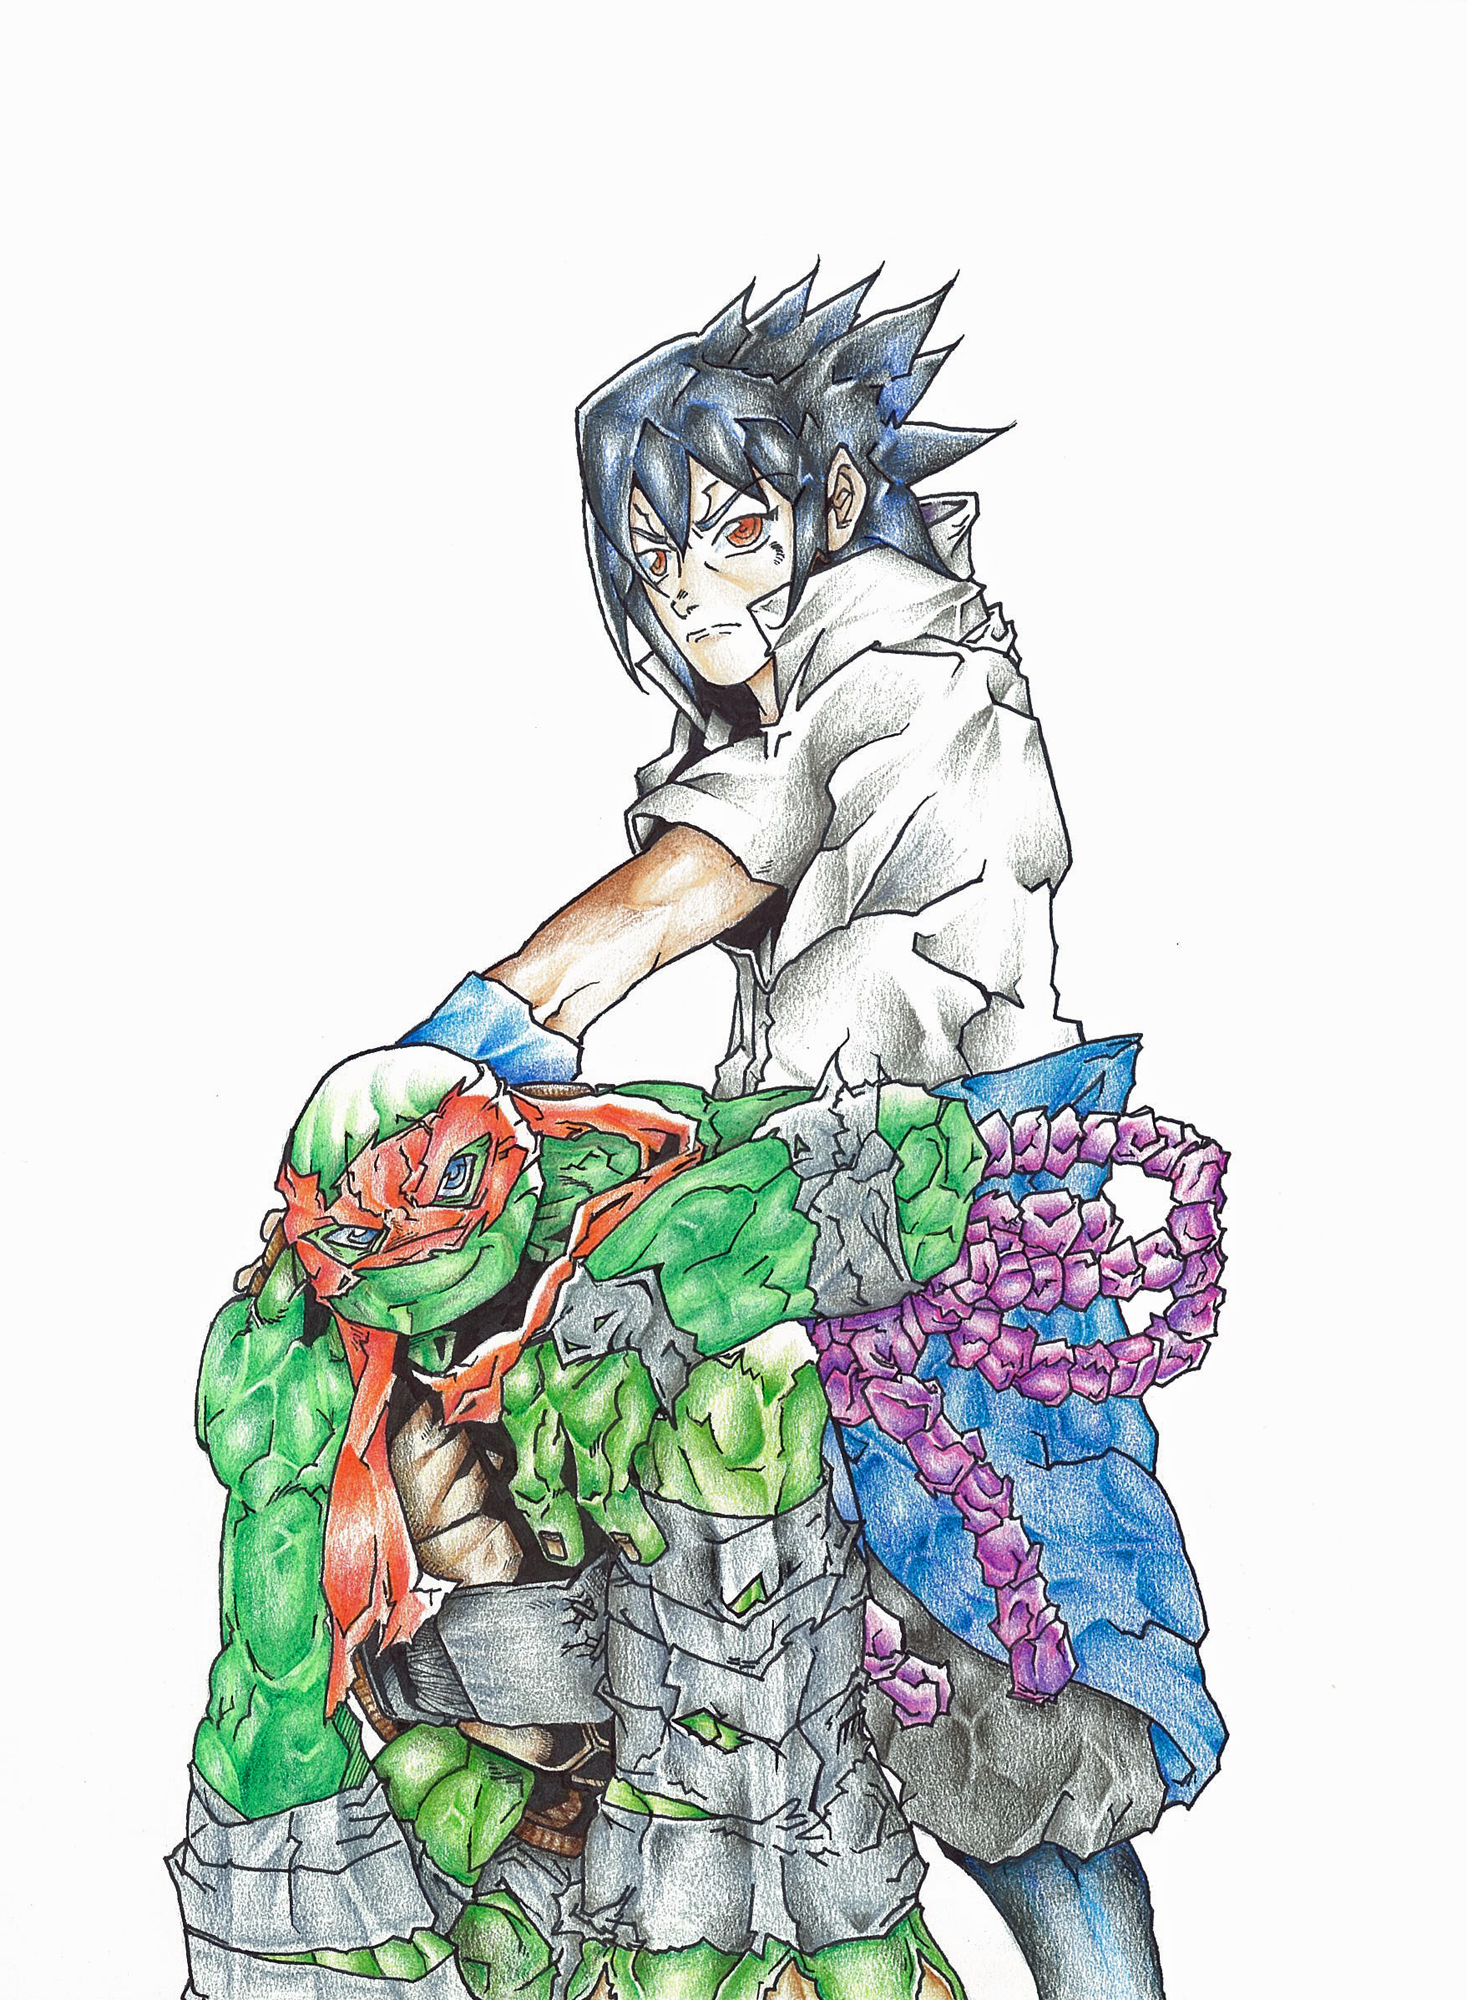 Sasuke summons the party dude by Rodimus84